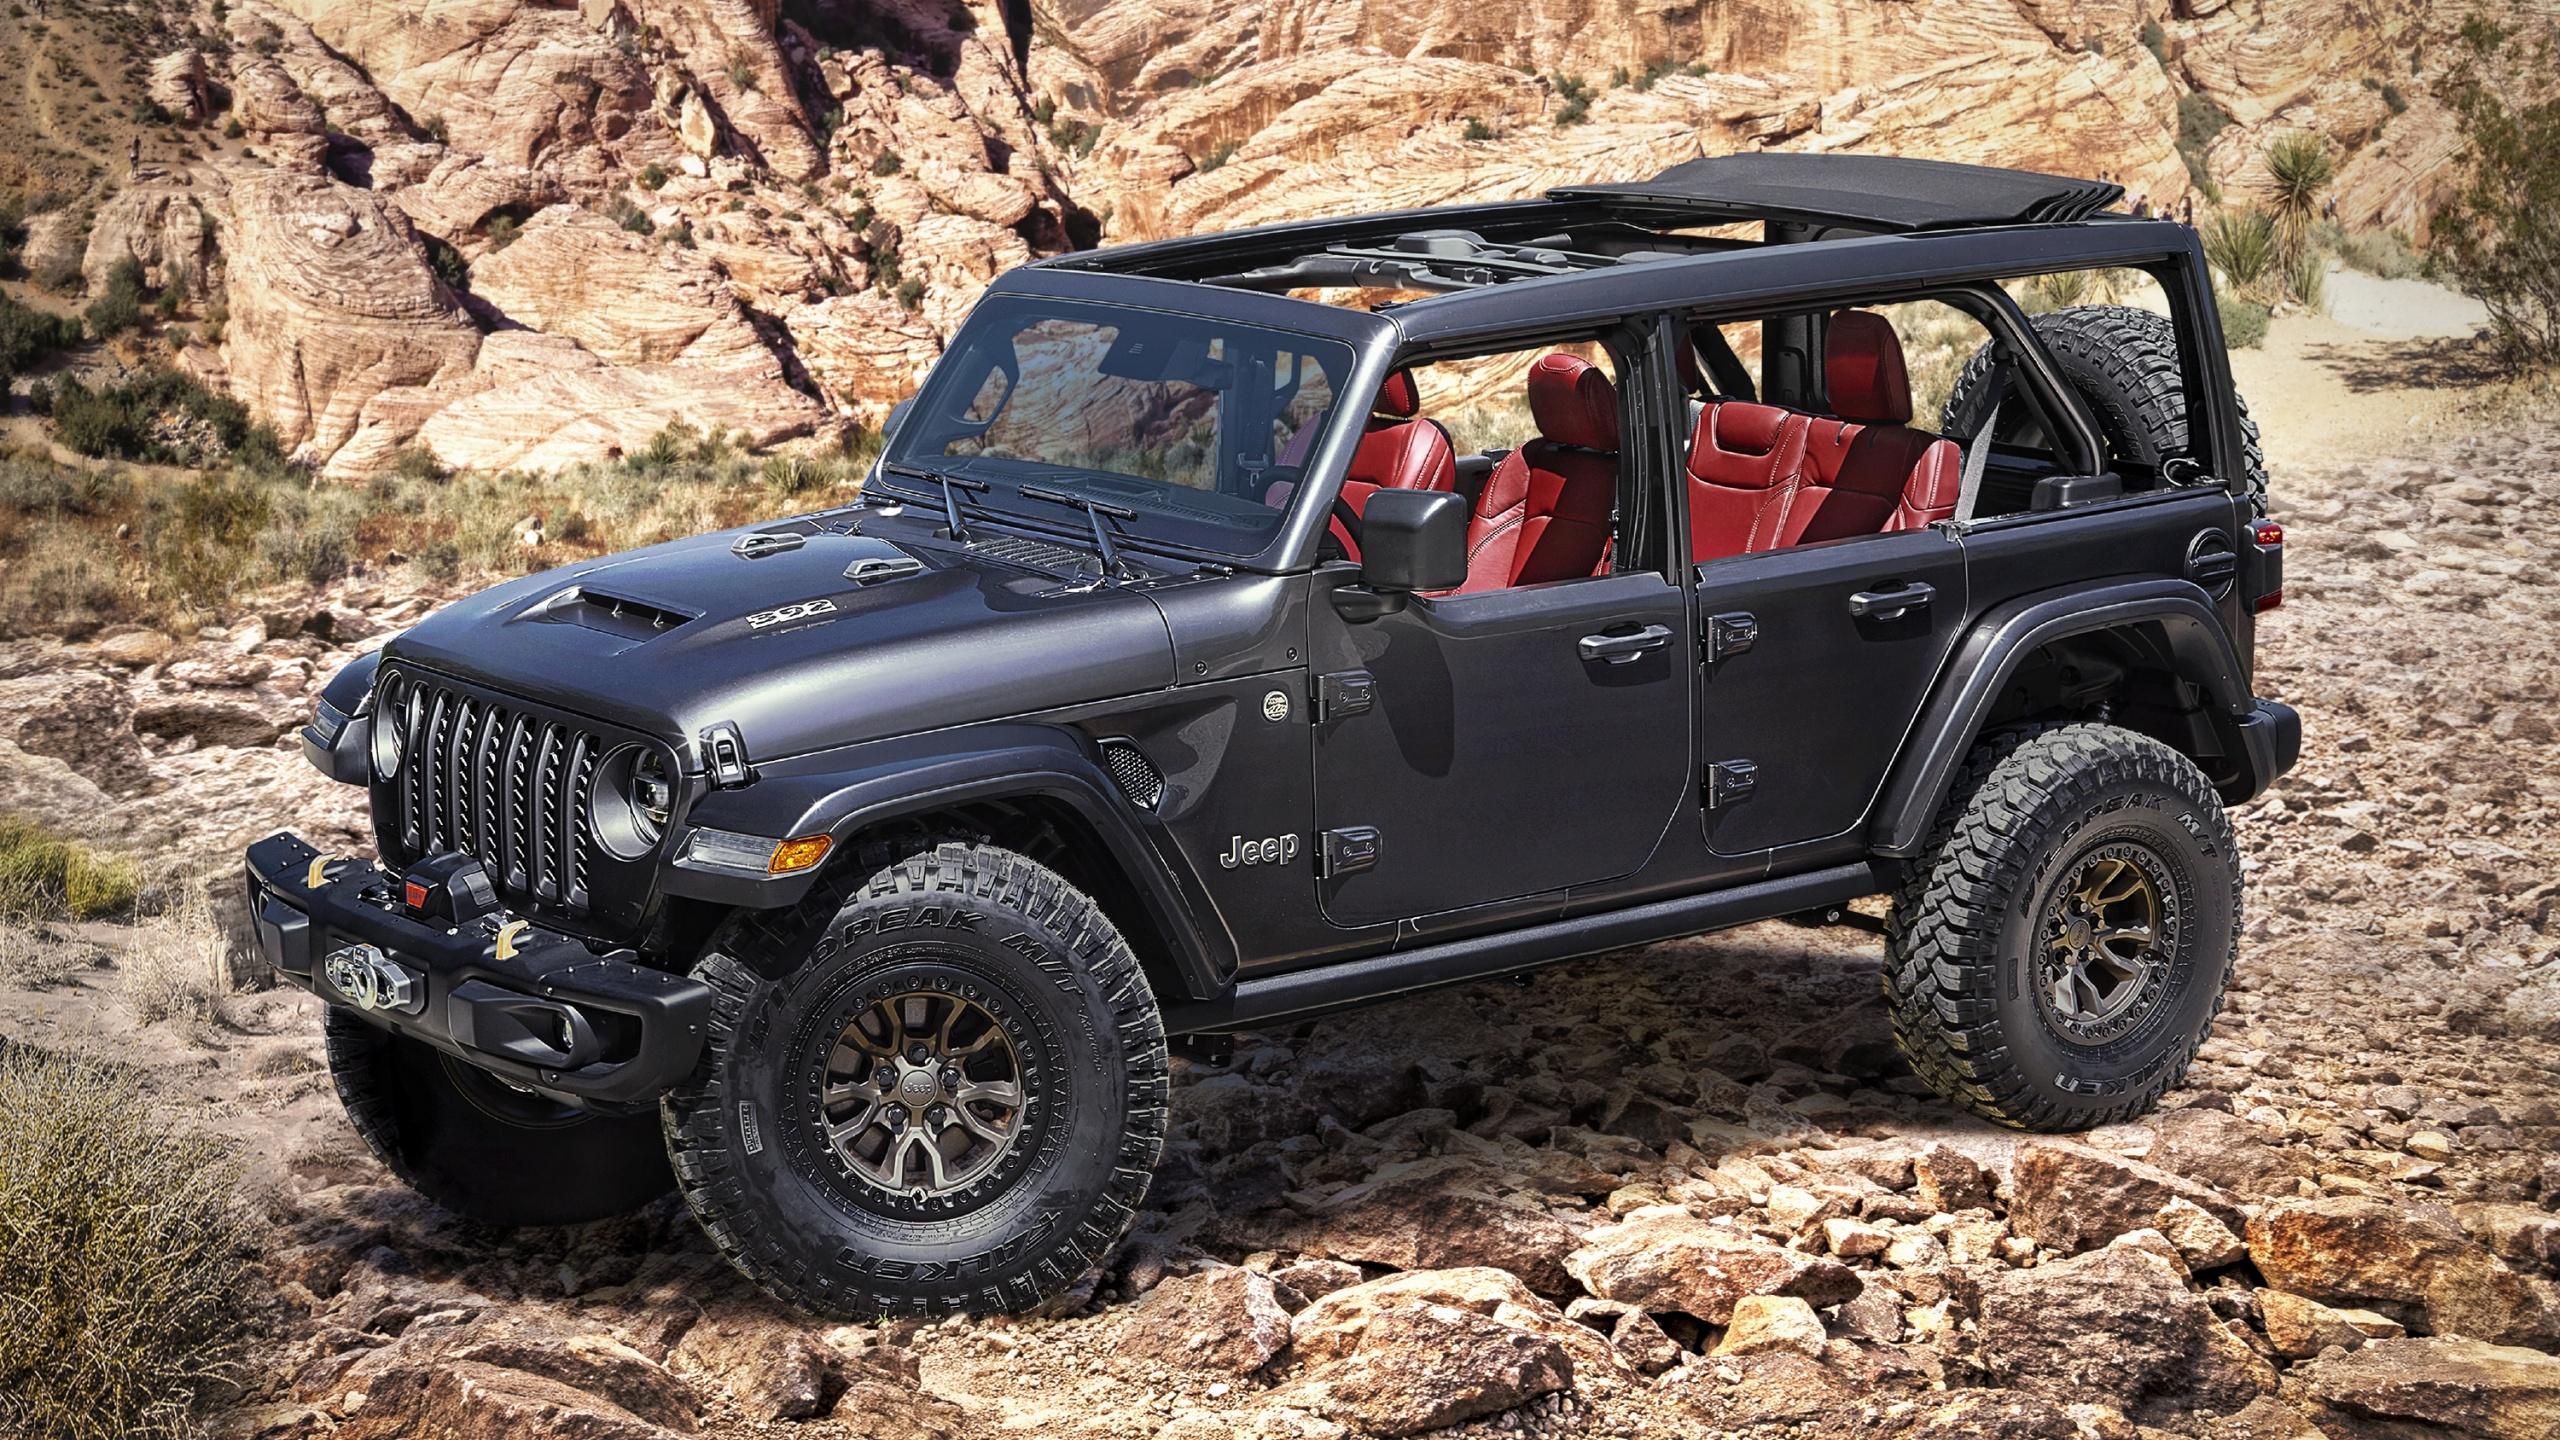 Jeep Wrangler Rubicon 392 Concept 4k Wallpaper 2020 Cars 1847